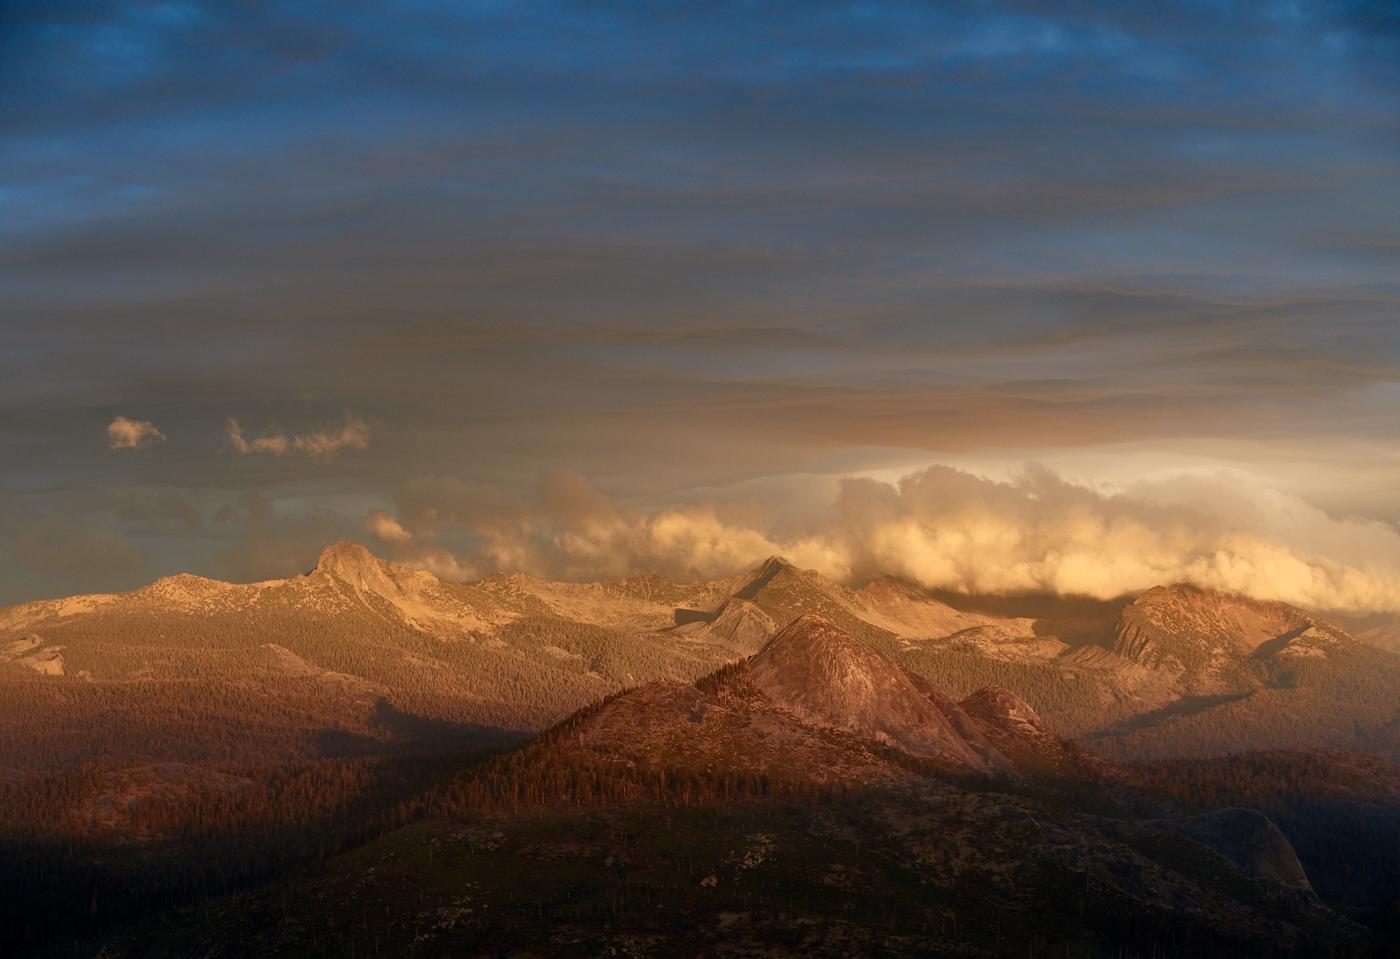 Squall Ansel Adams Wilderness.jpg